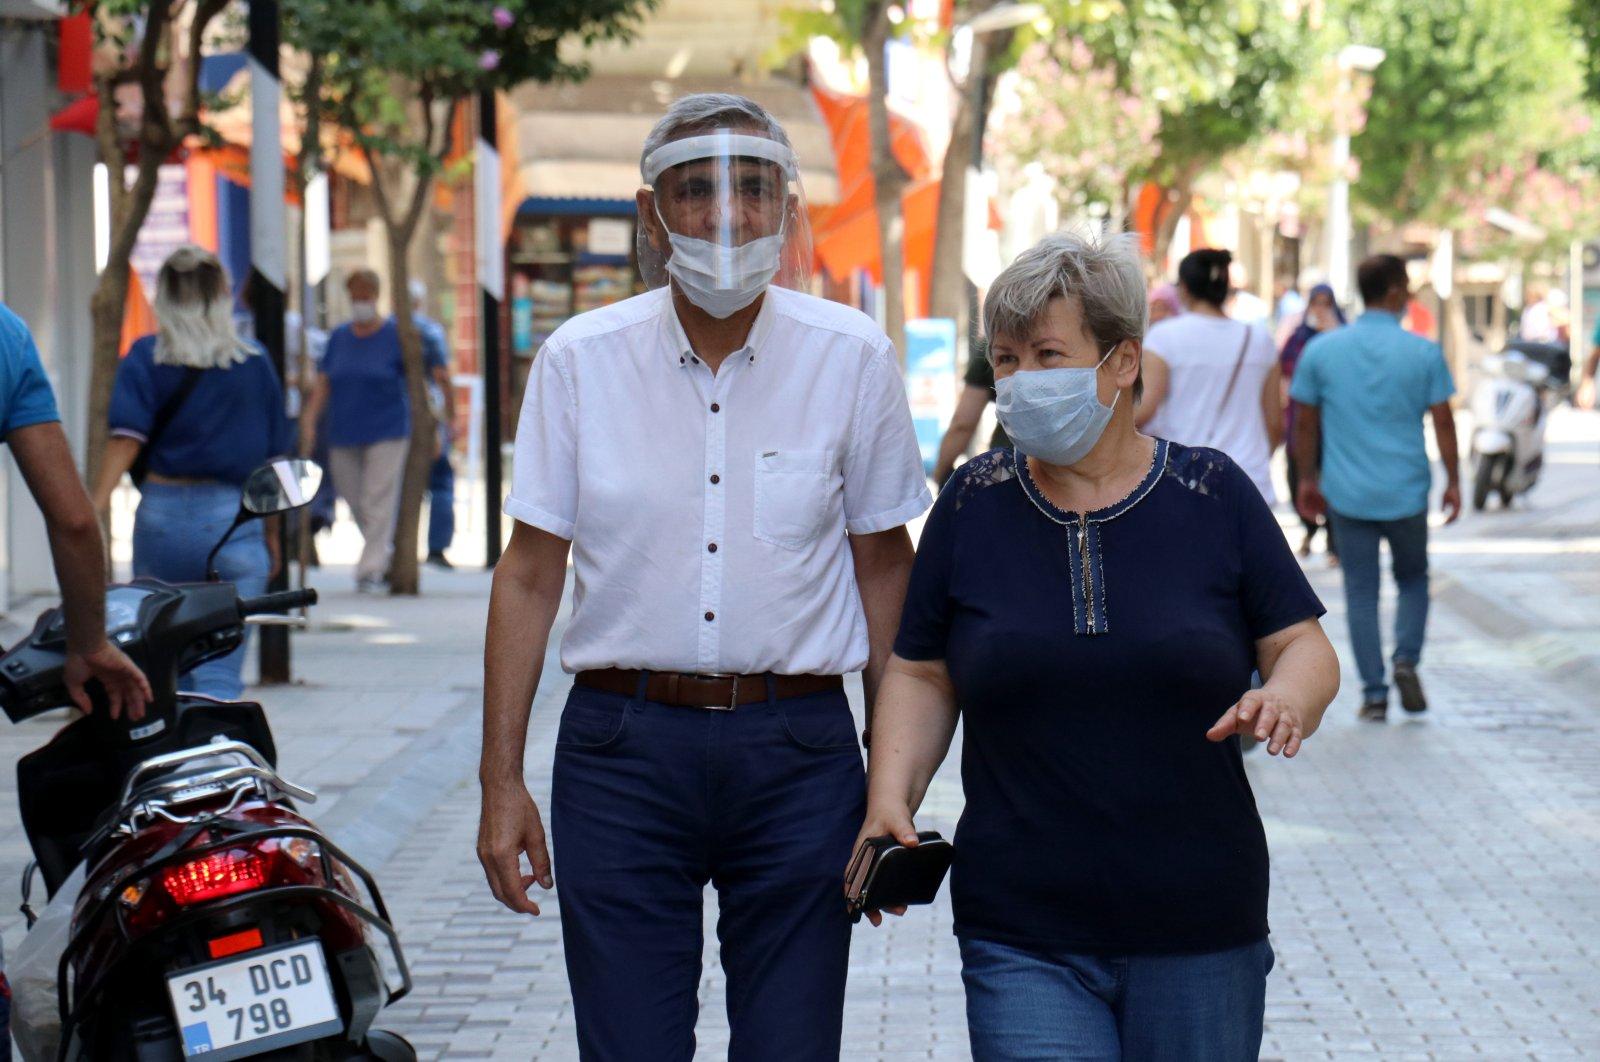 People wearing face masks walk on a main street in the province of Kırklareli, northwestern Turkey, Aug. 7, 2020. (AA Photo)